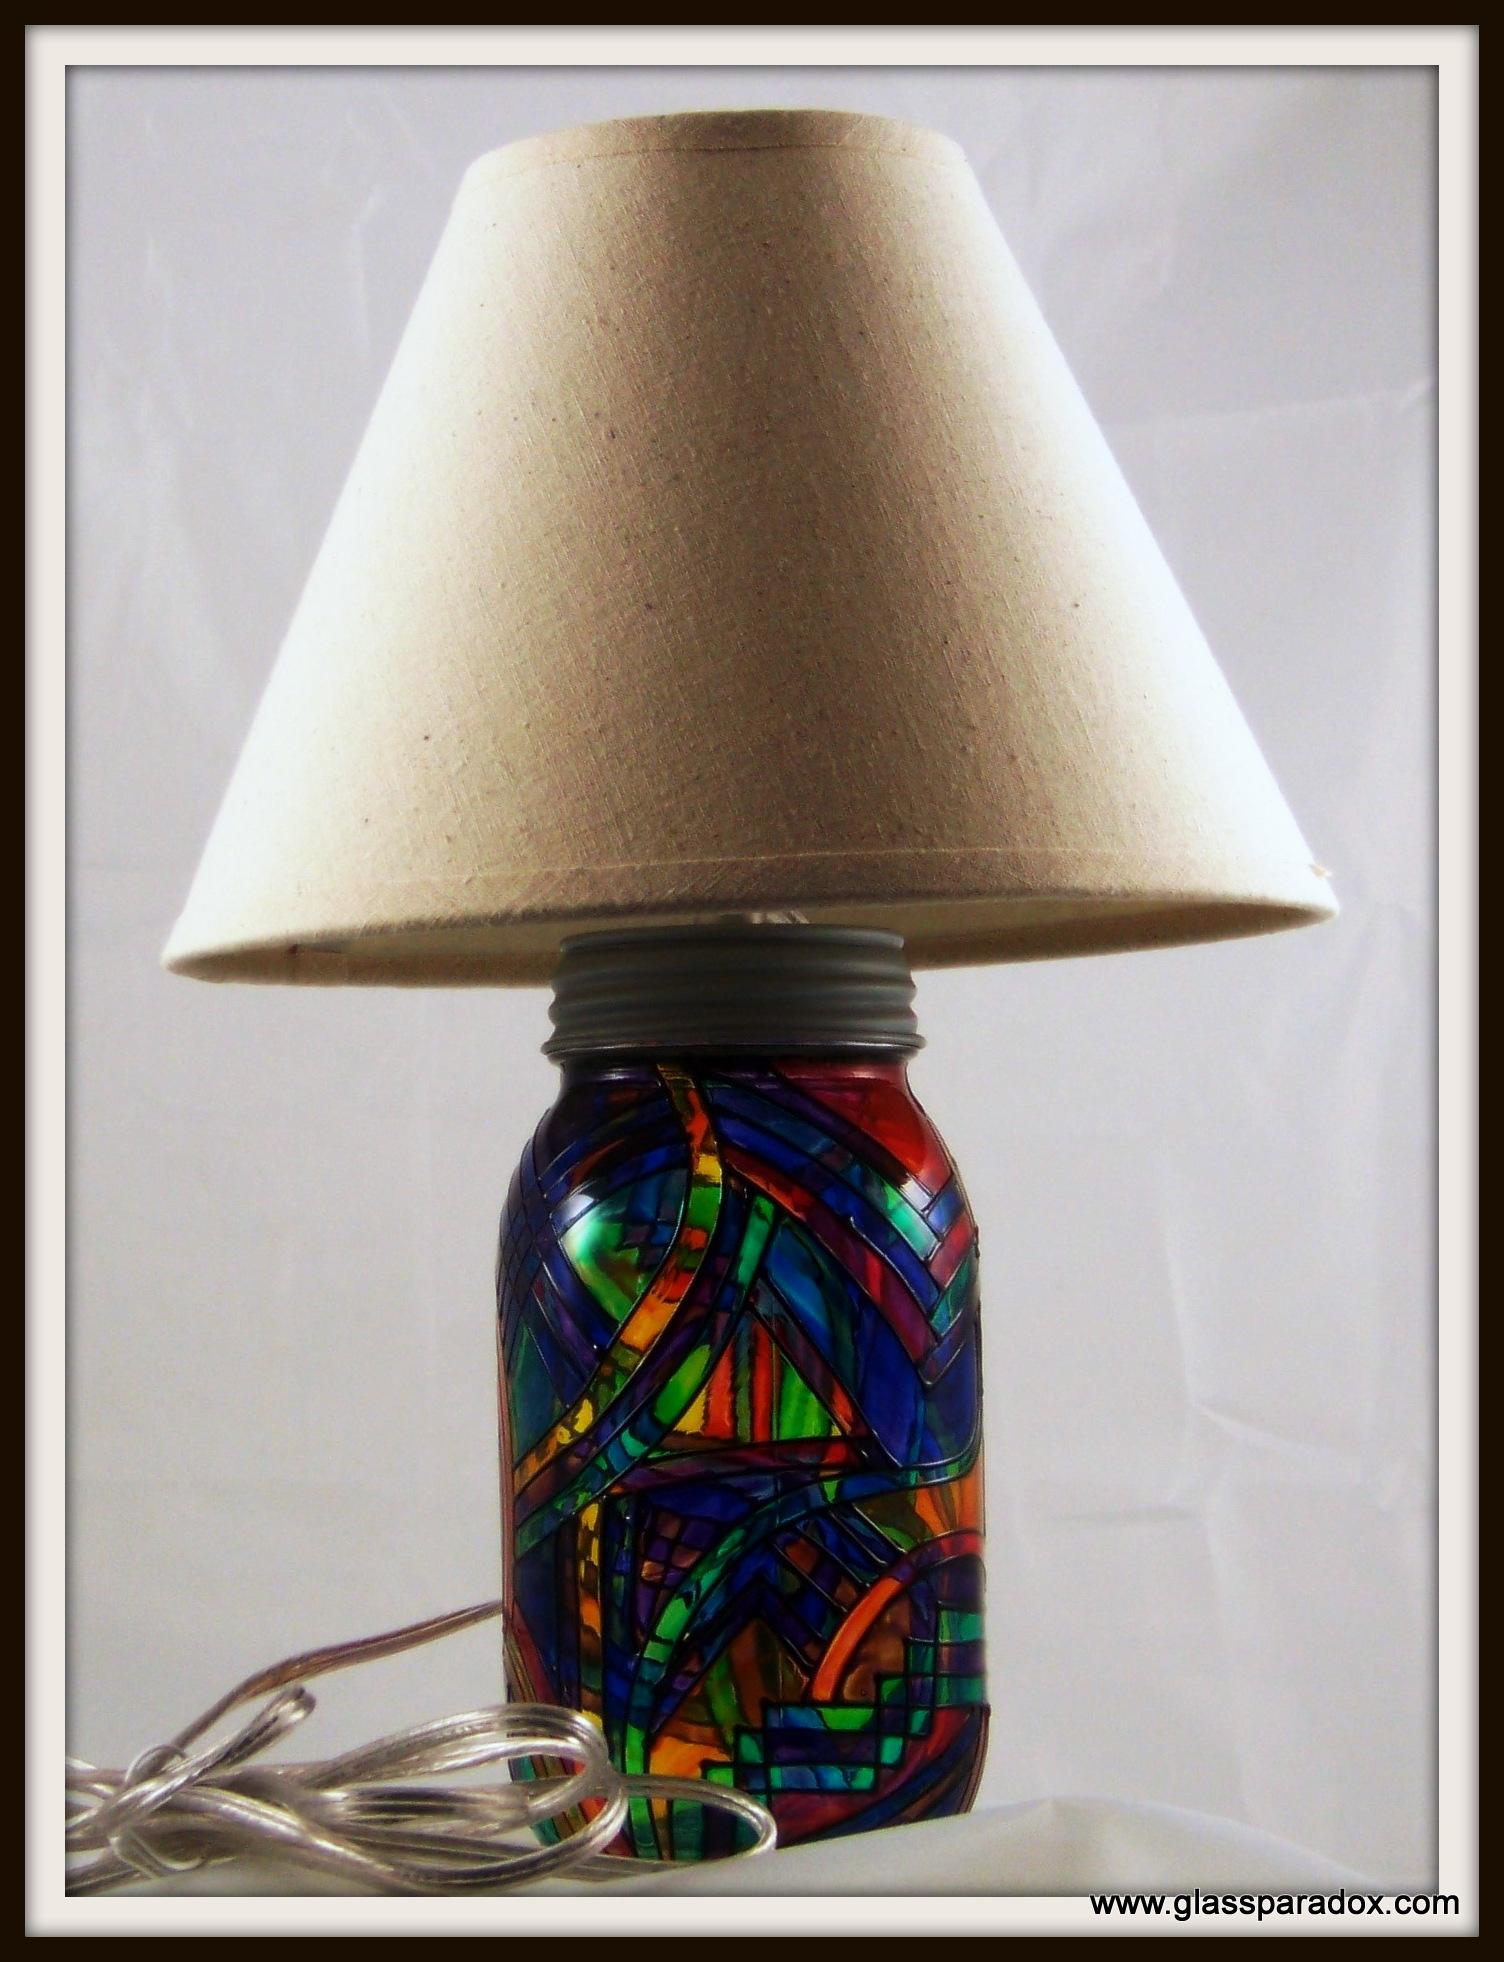 brite-lamp.jpg